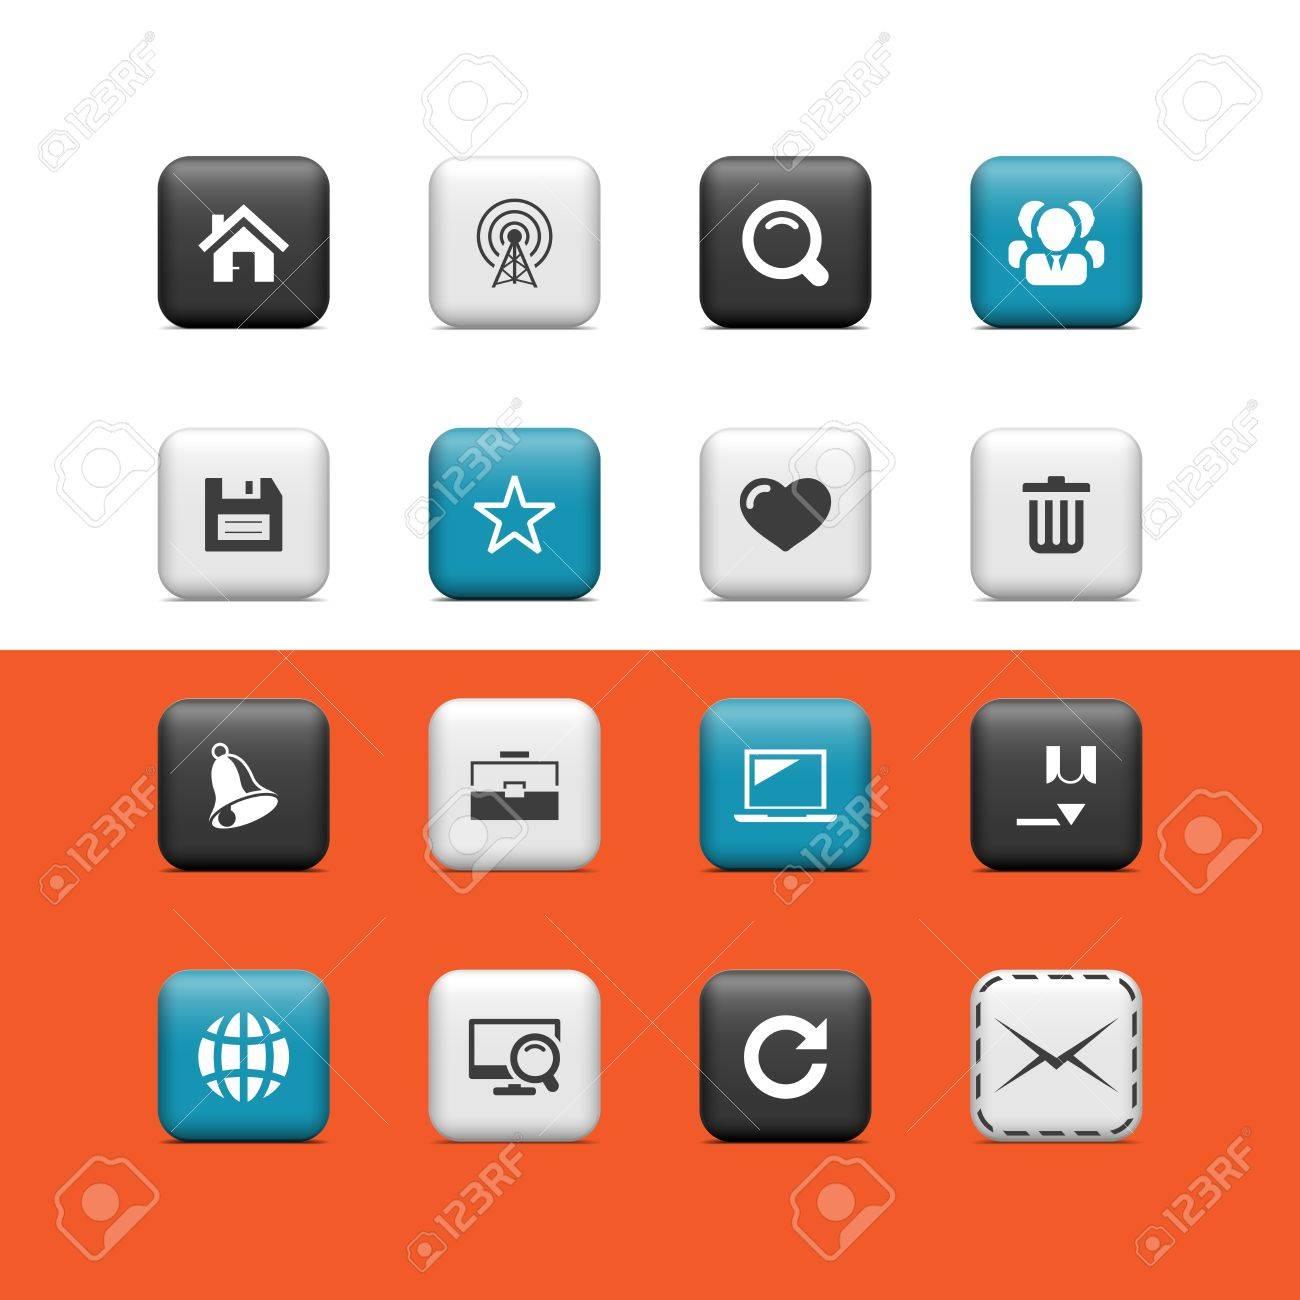 Web buttons Stock Vector - 15445636